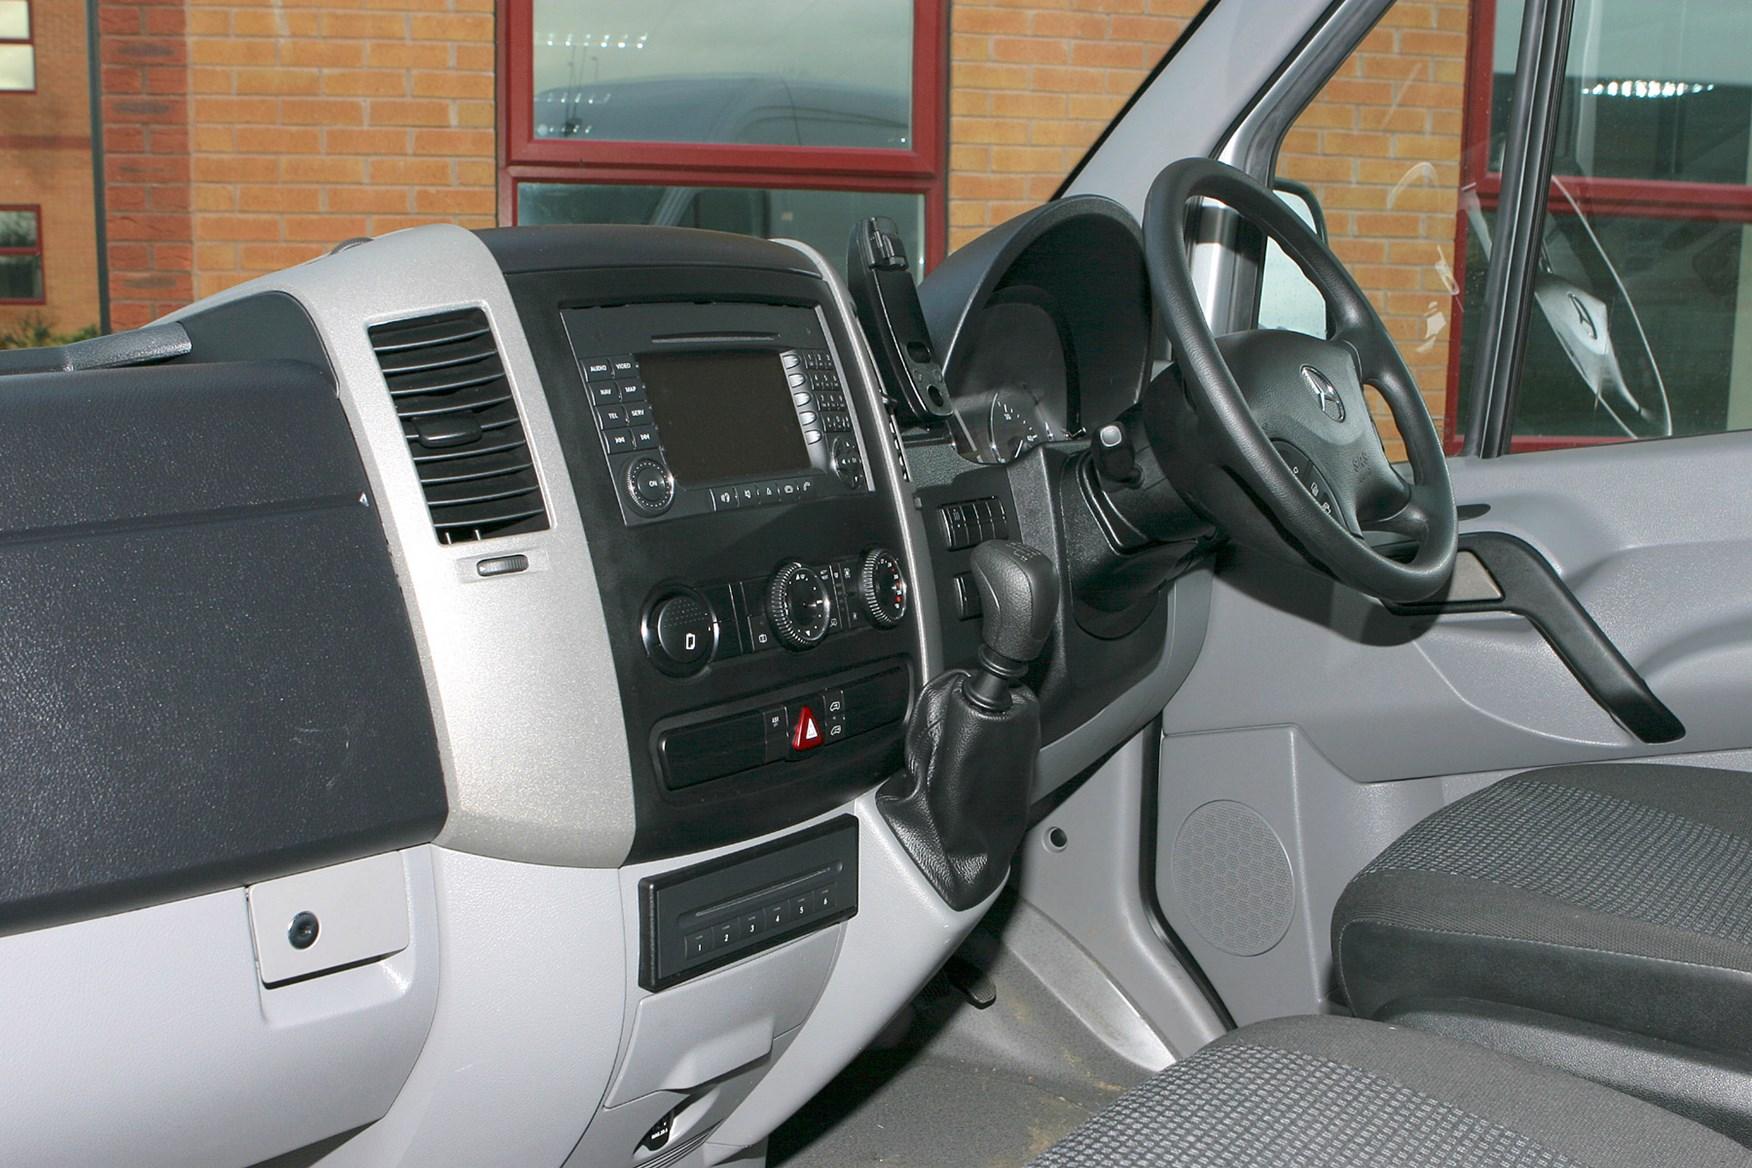 Mercedes-Benz Sprinter 2006-2013 review on Parkers Vans - cabin, interior